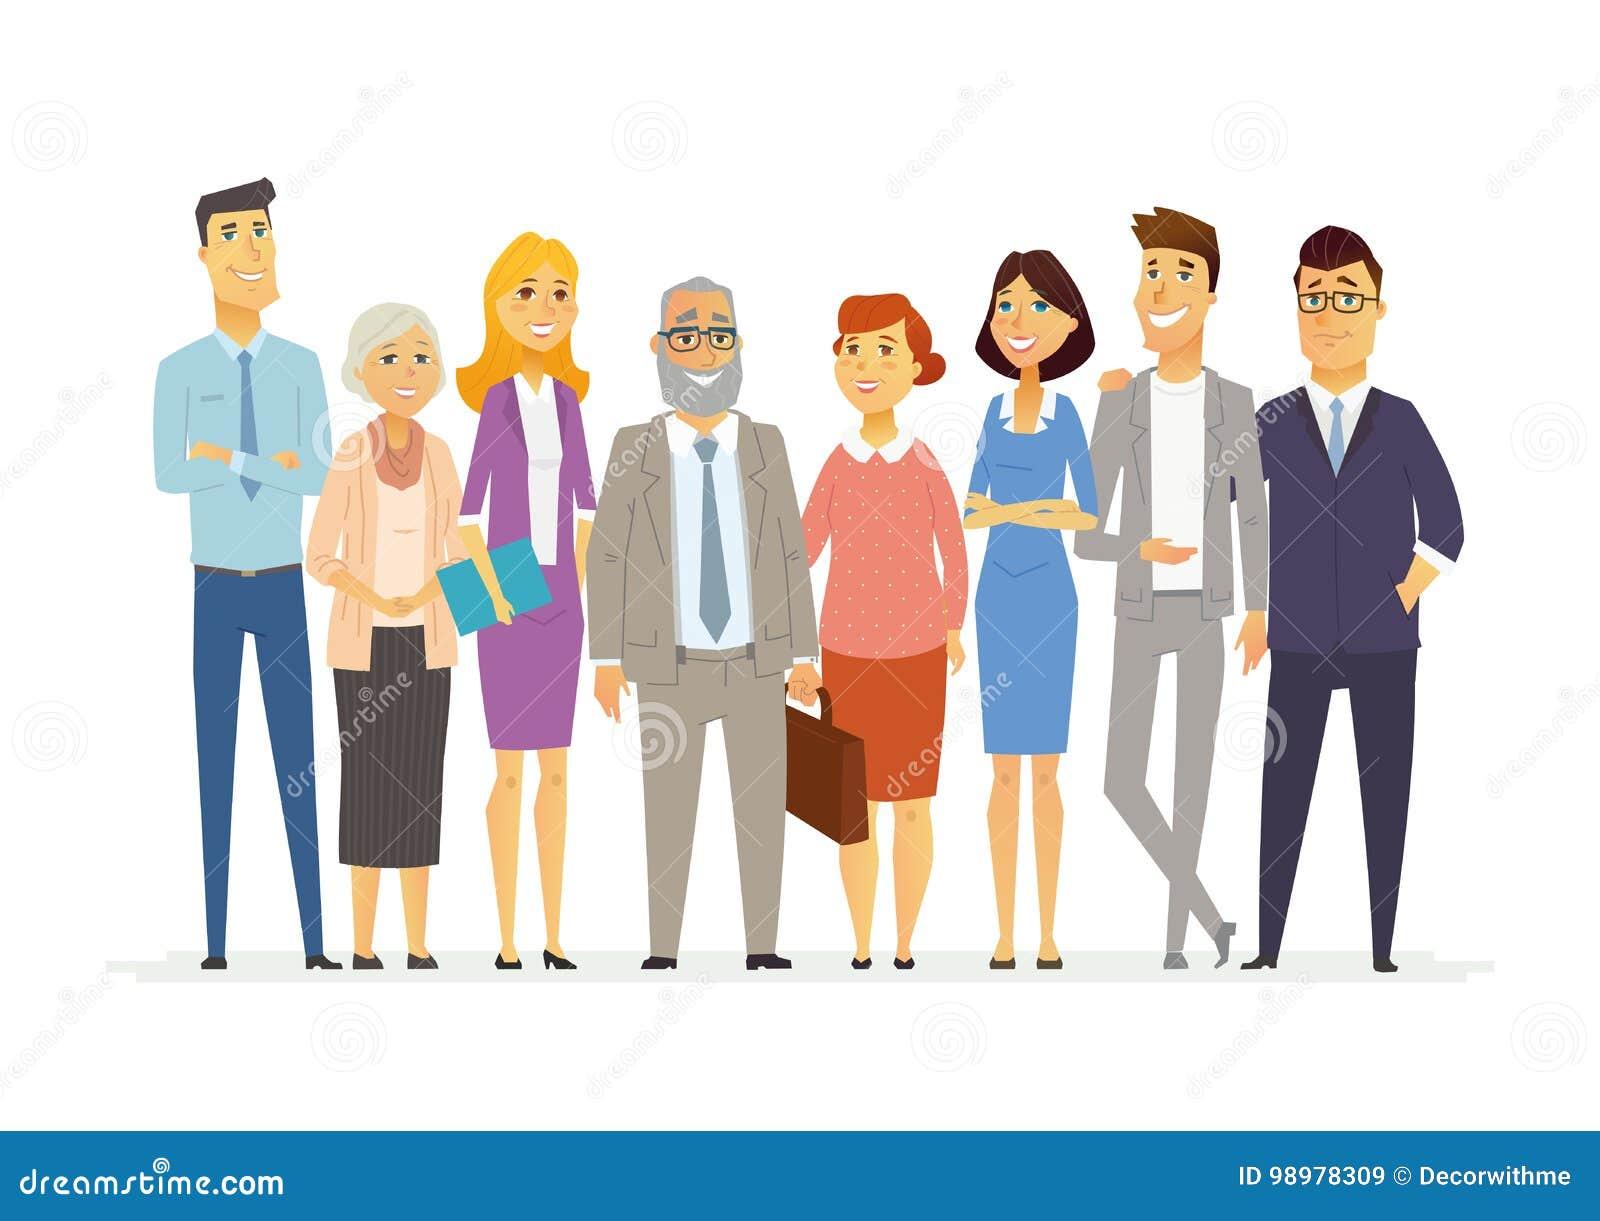 Business team cartoon characters cartoon vector cartoondealer com - Vector Meeting Scene With Cartoon Business People Cartoon Vector Cartoondealer Com 29962899